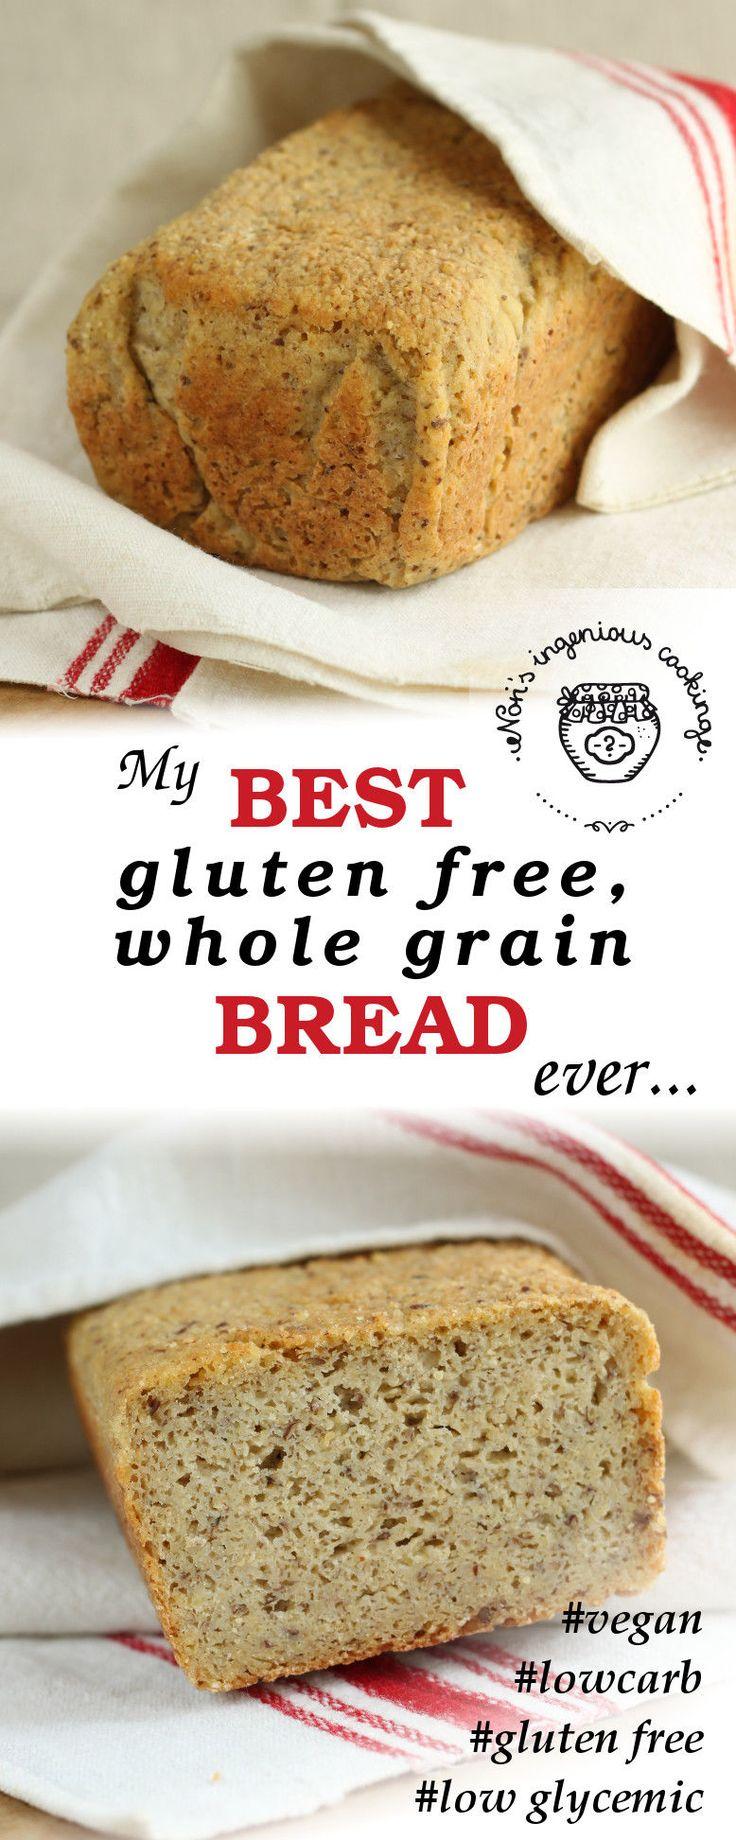 My best gluten-free, whole grain bread, ever! (vegan recipe)